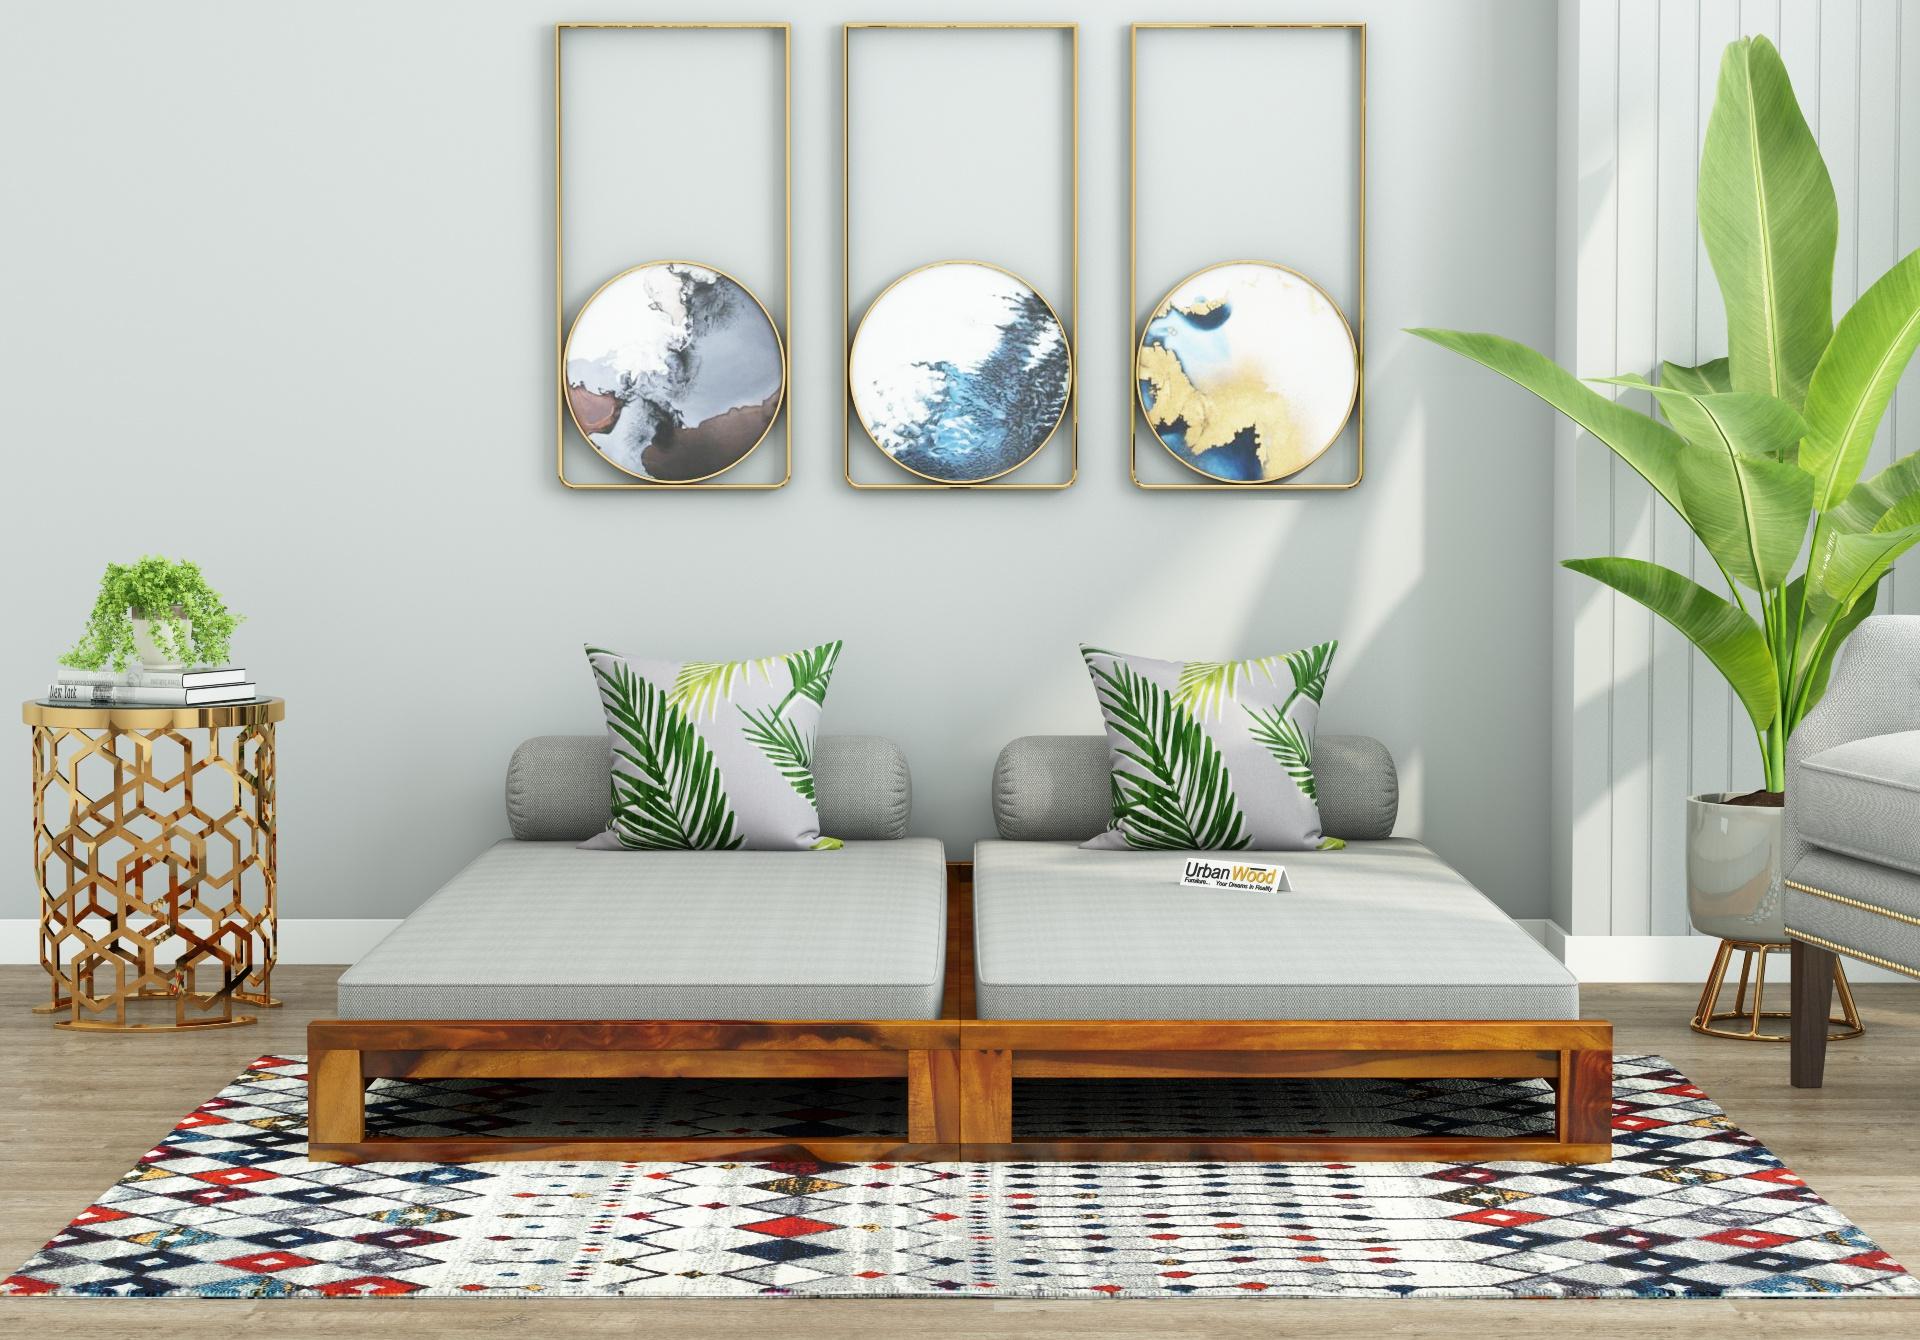 Aper Wooden Sofa Cum Bed <small>(Honey Finish)</small>